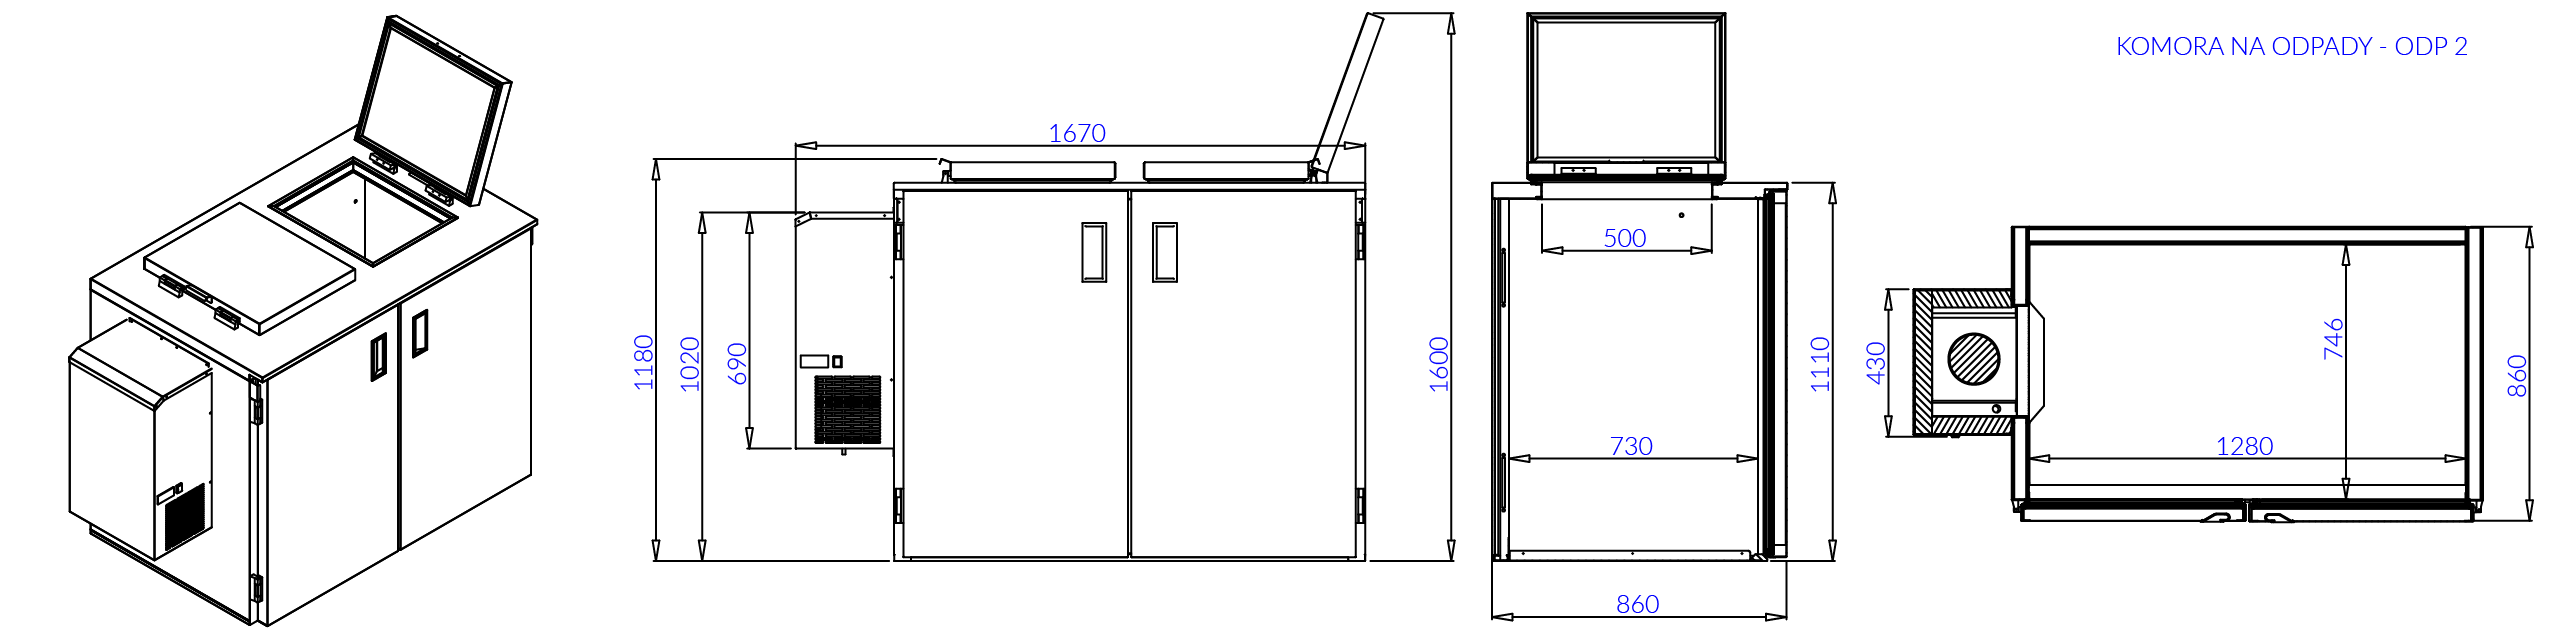 Rysunek techniczny KOMORA ODP 2